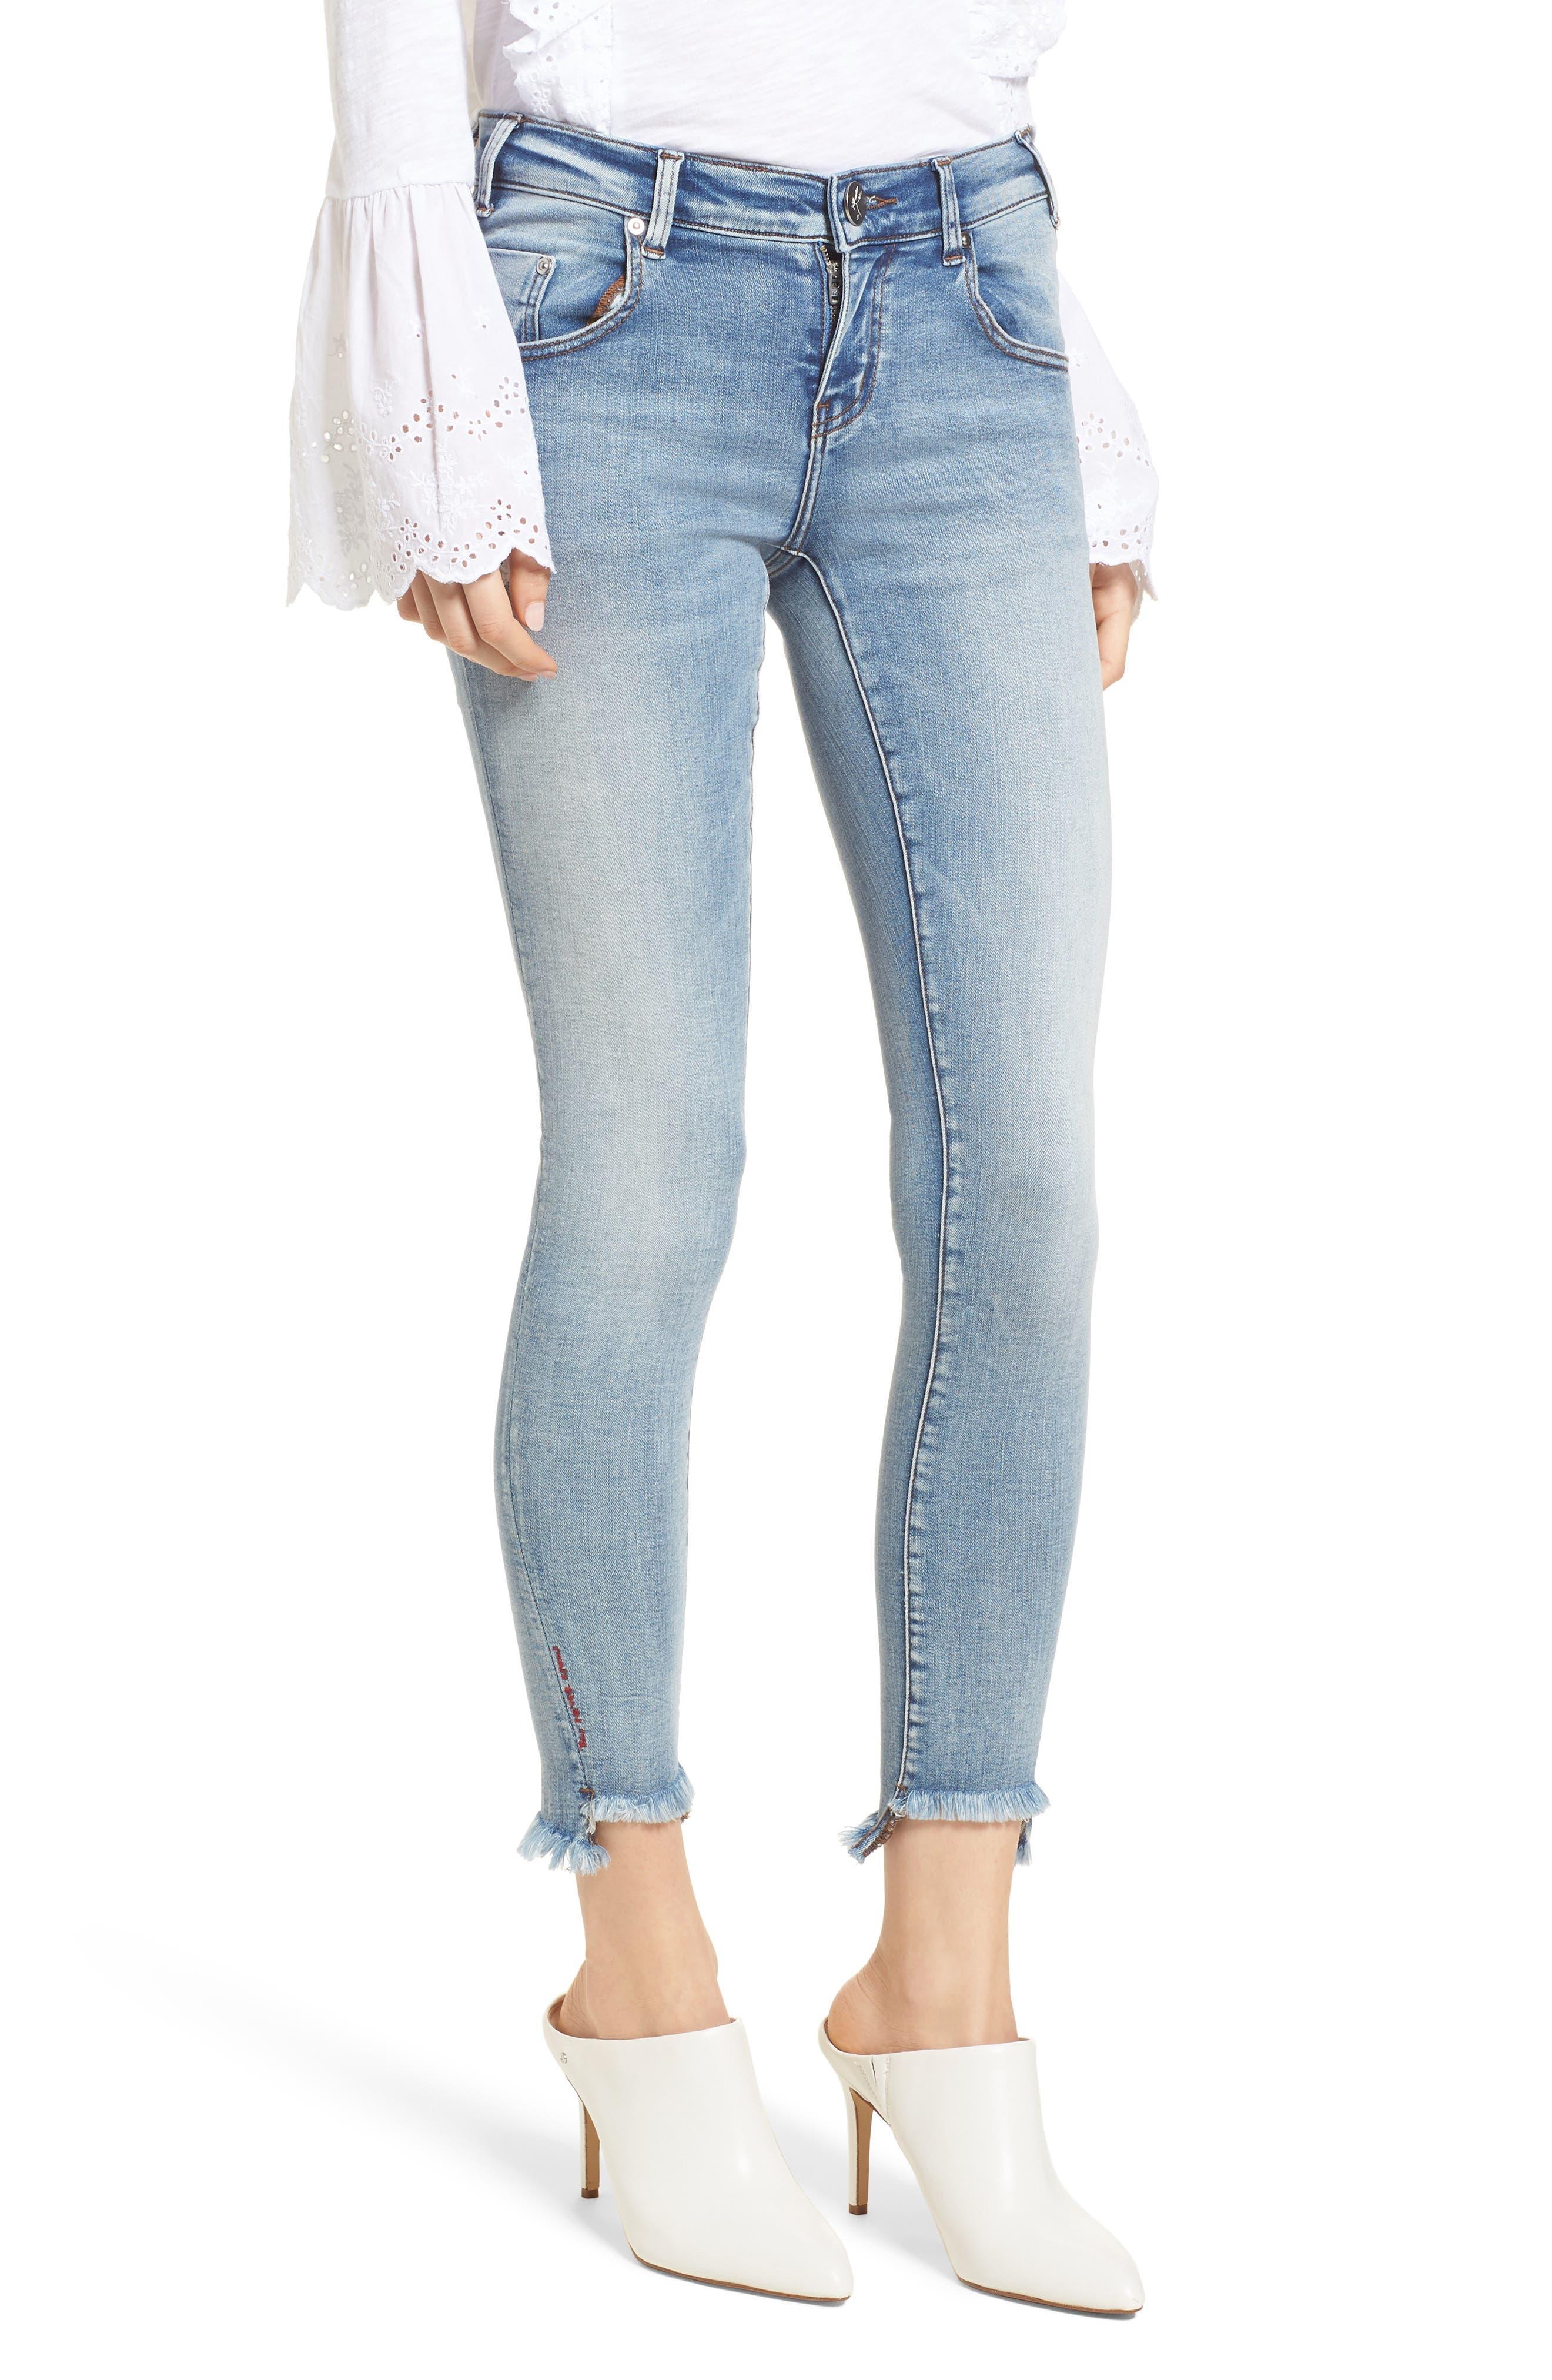 Freebirds Skinny Jeans,                         Main,                         color, Cobaine